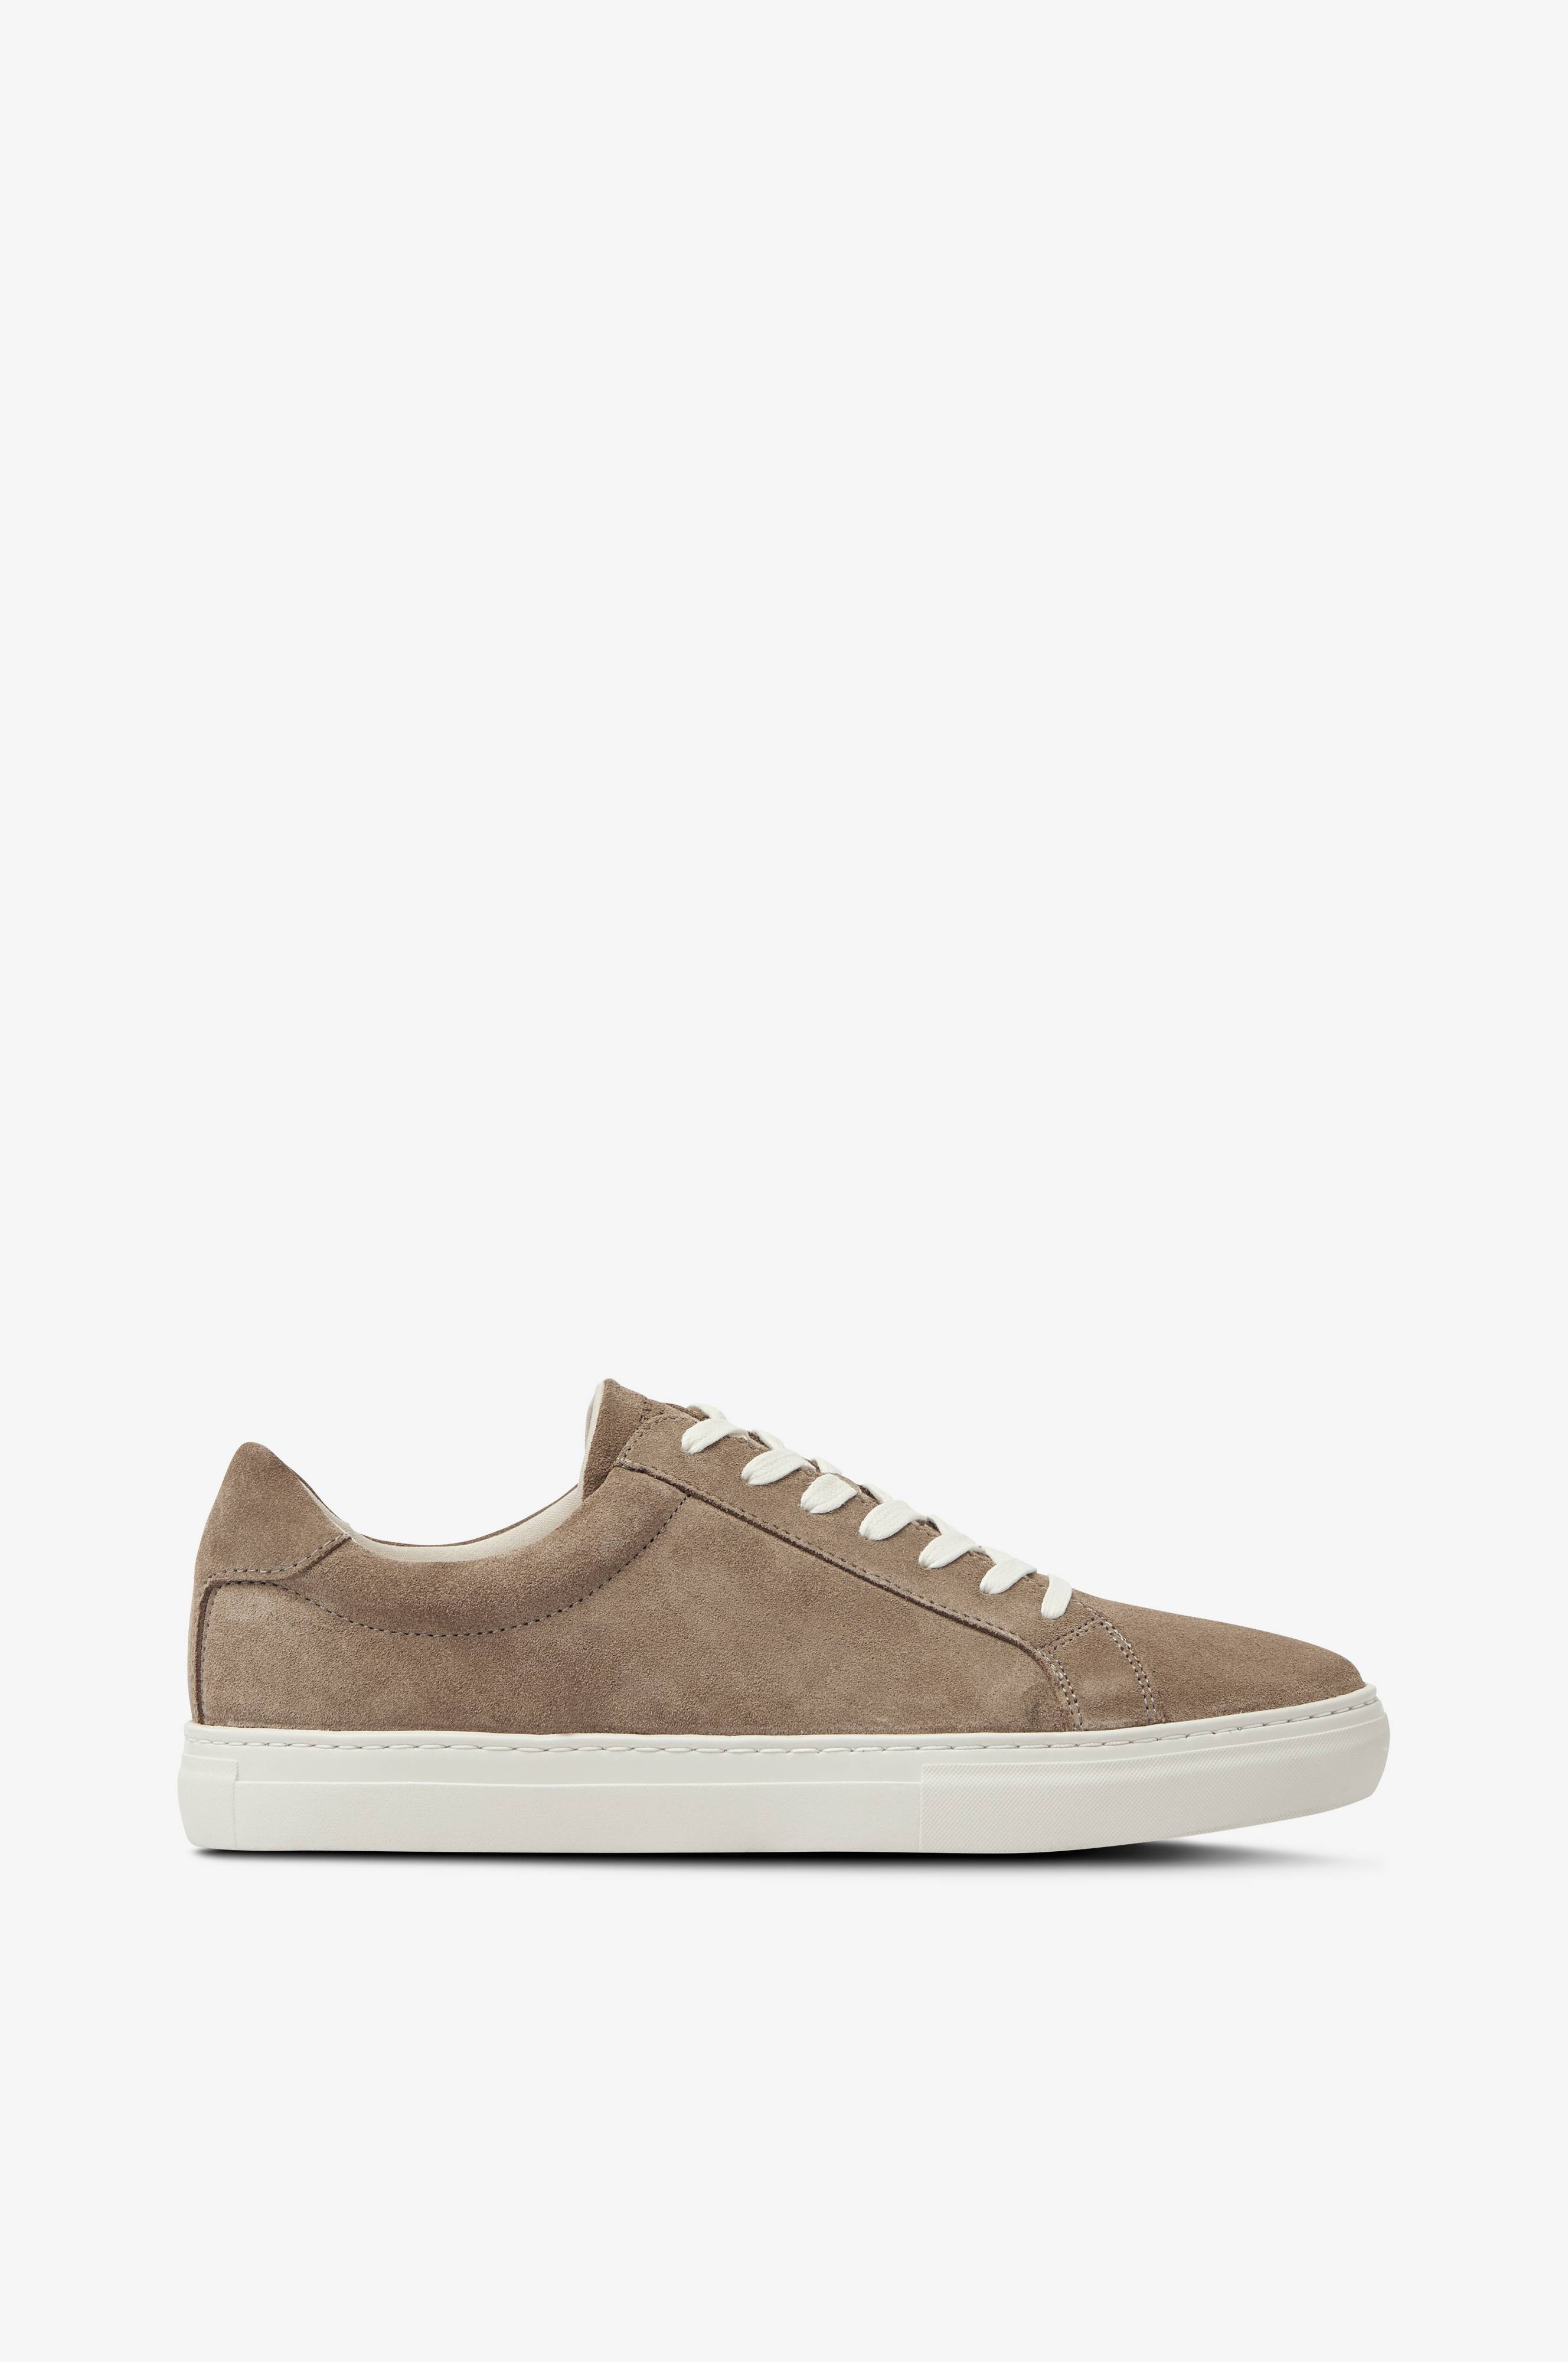 Sneakers Paul i semsket skinn